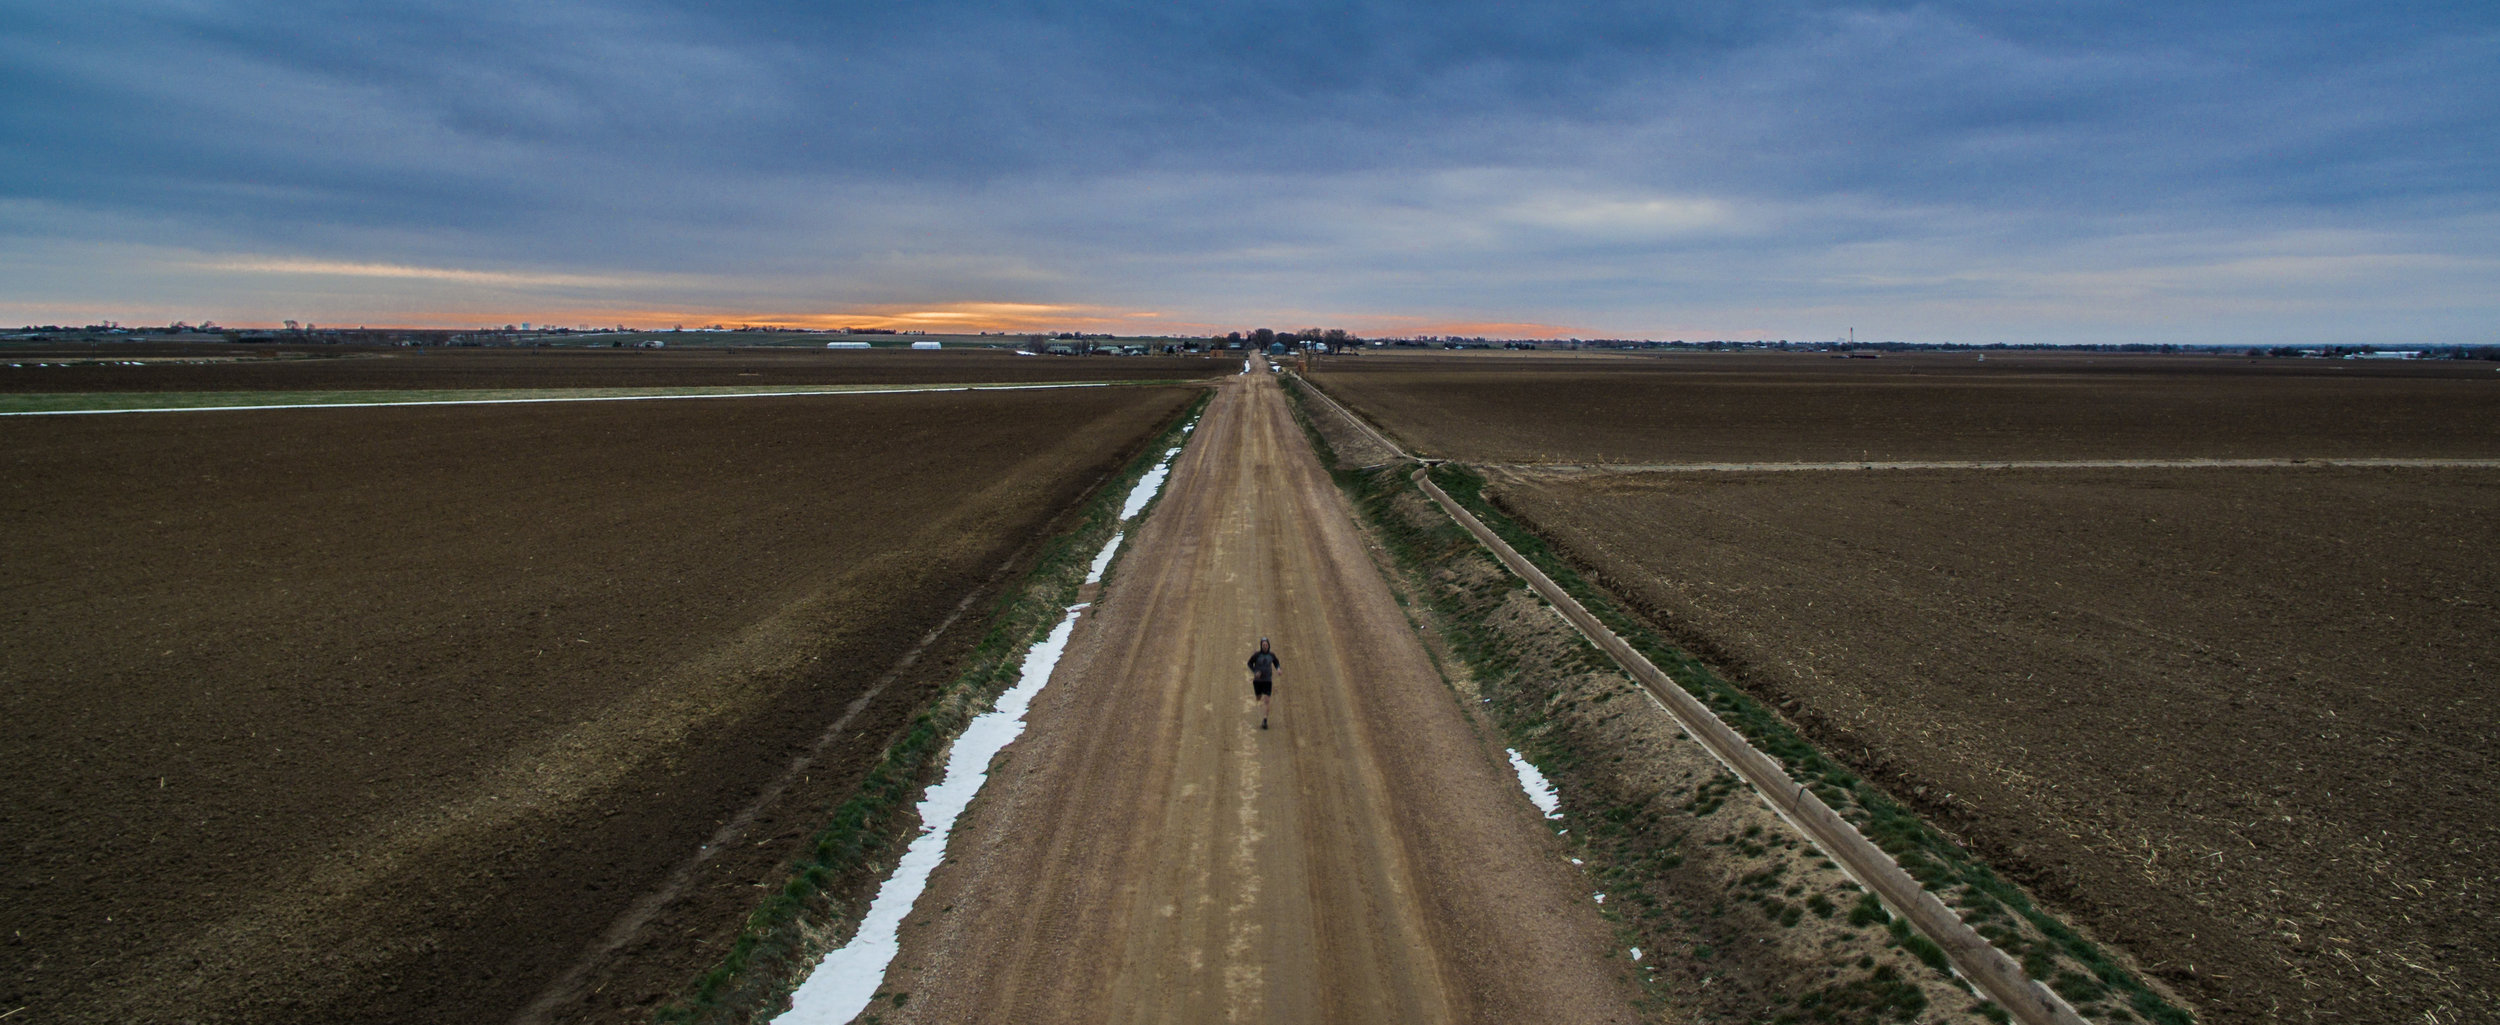 Trev_running on road_aerial (photo by Dustin Etheredge).jpg